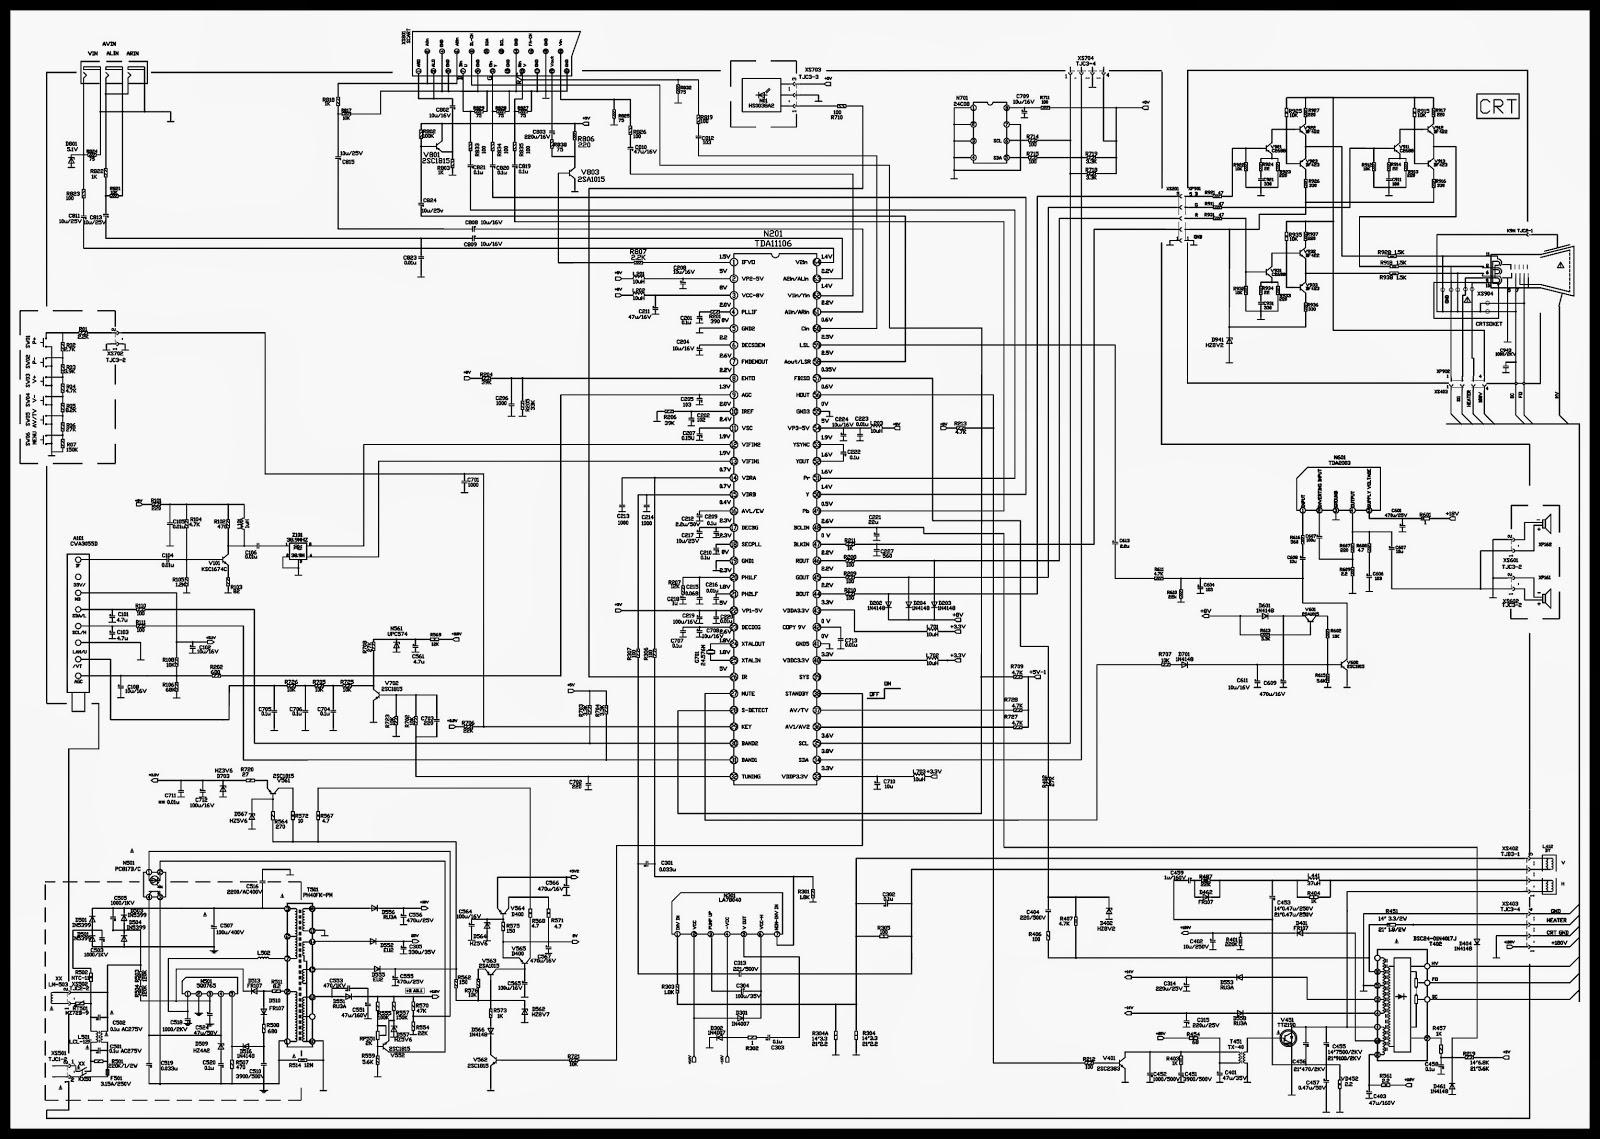 tv tuner card circuit diagram 1998 ford explorer alternator wiring  the